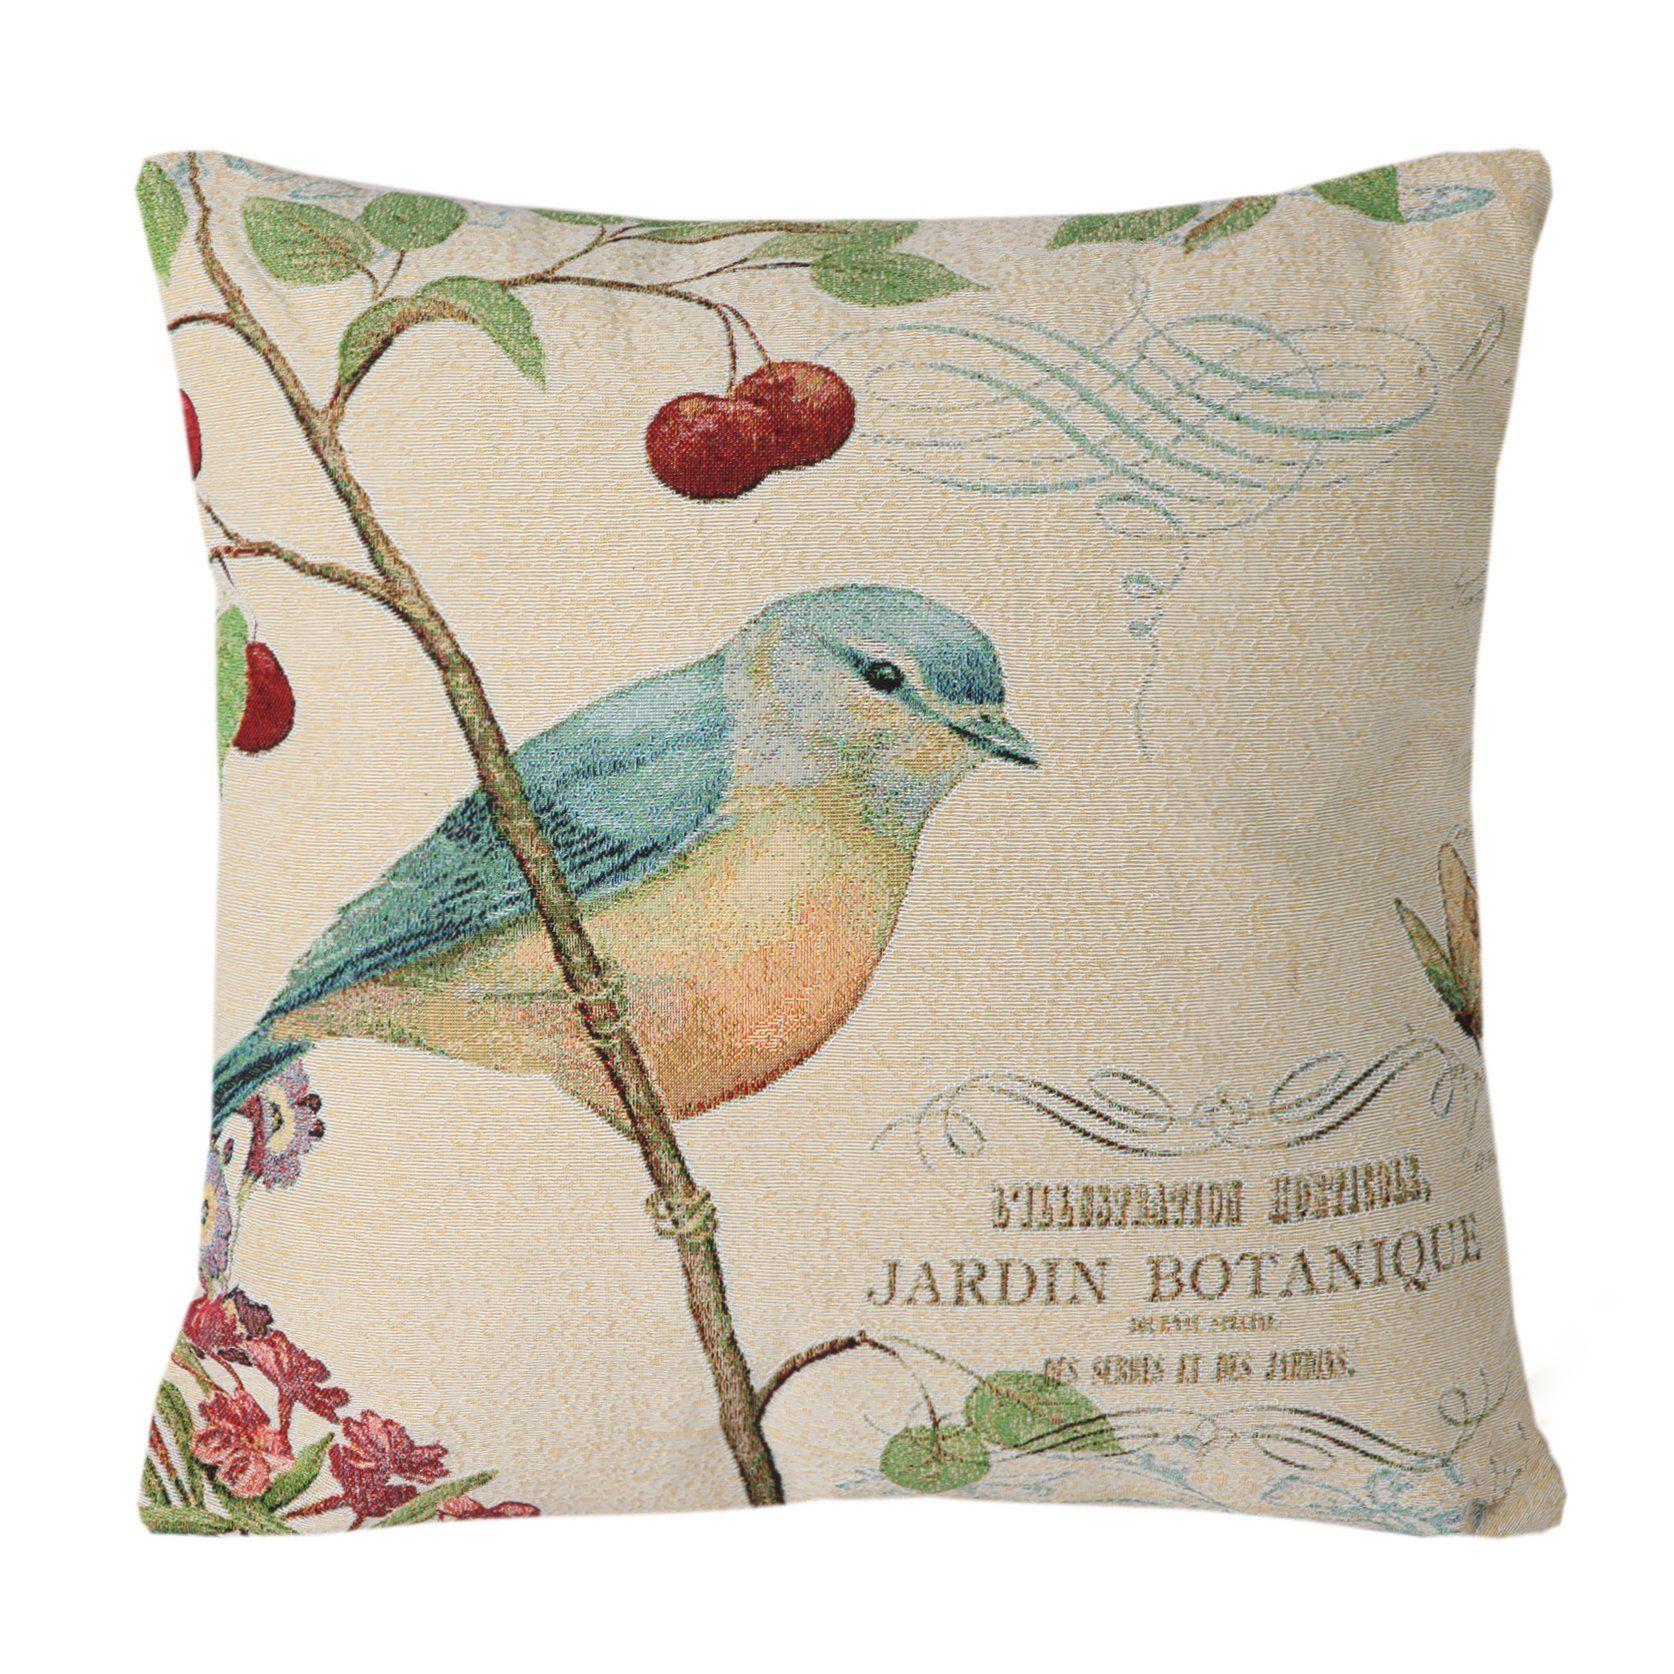 Simpledecor jacquard bird on the tree accent decorative throw pillow